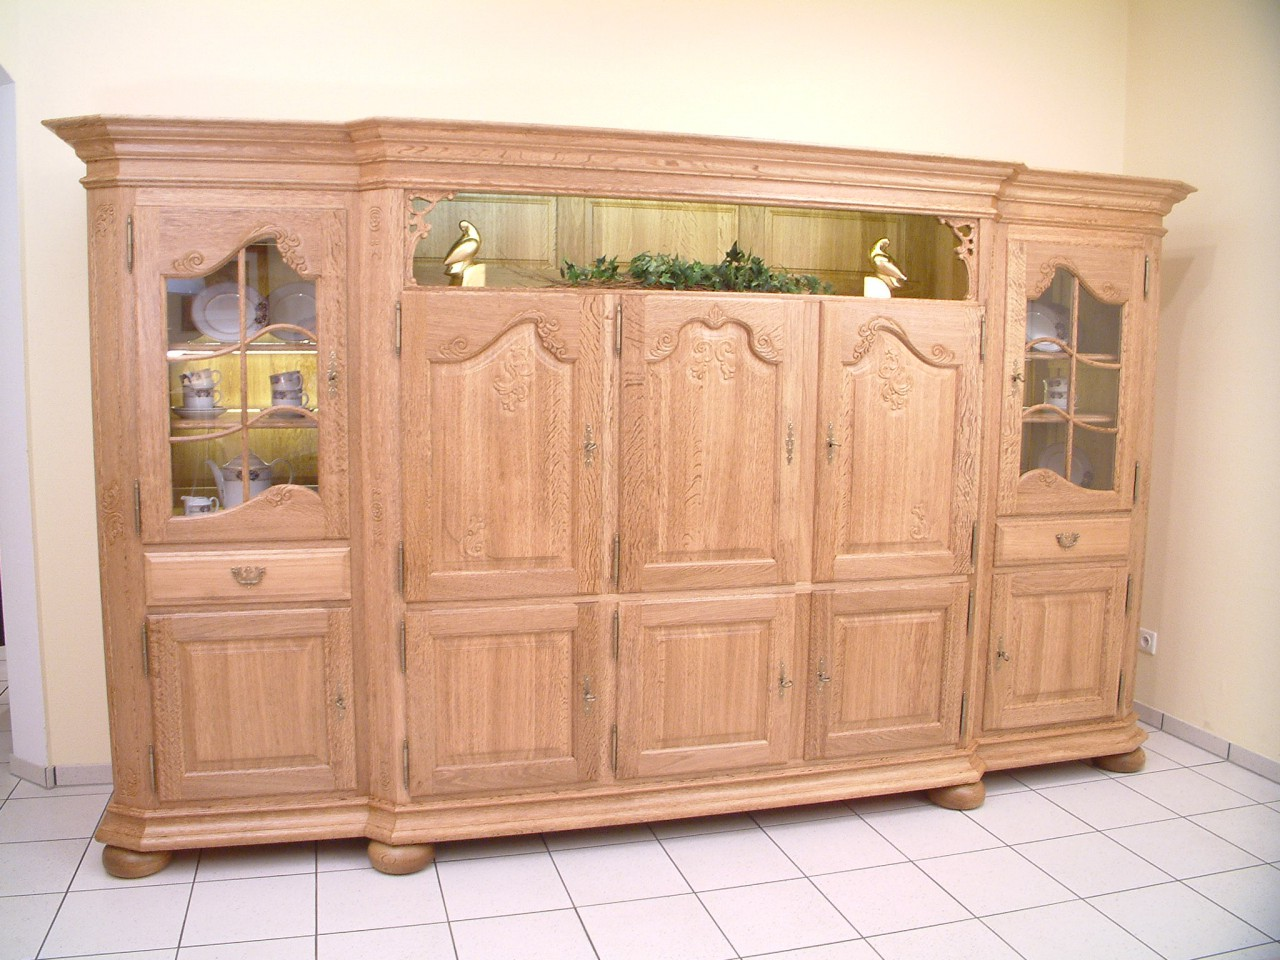 wohnzimmer tapeten design. Black Bedroom Furniture Sets. Home Design Ideas